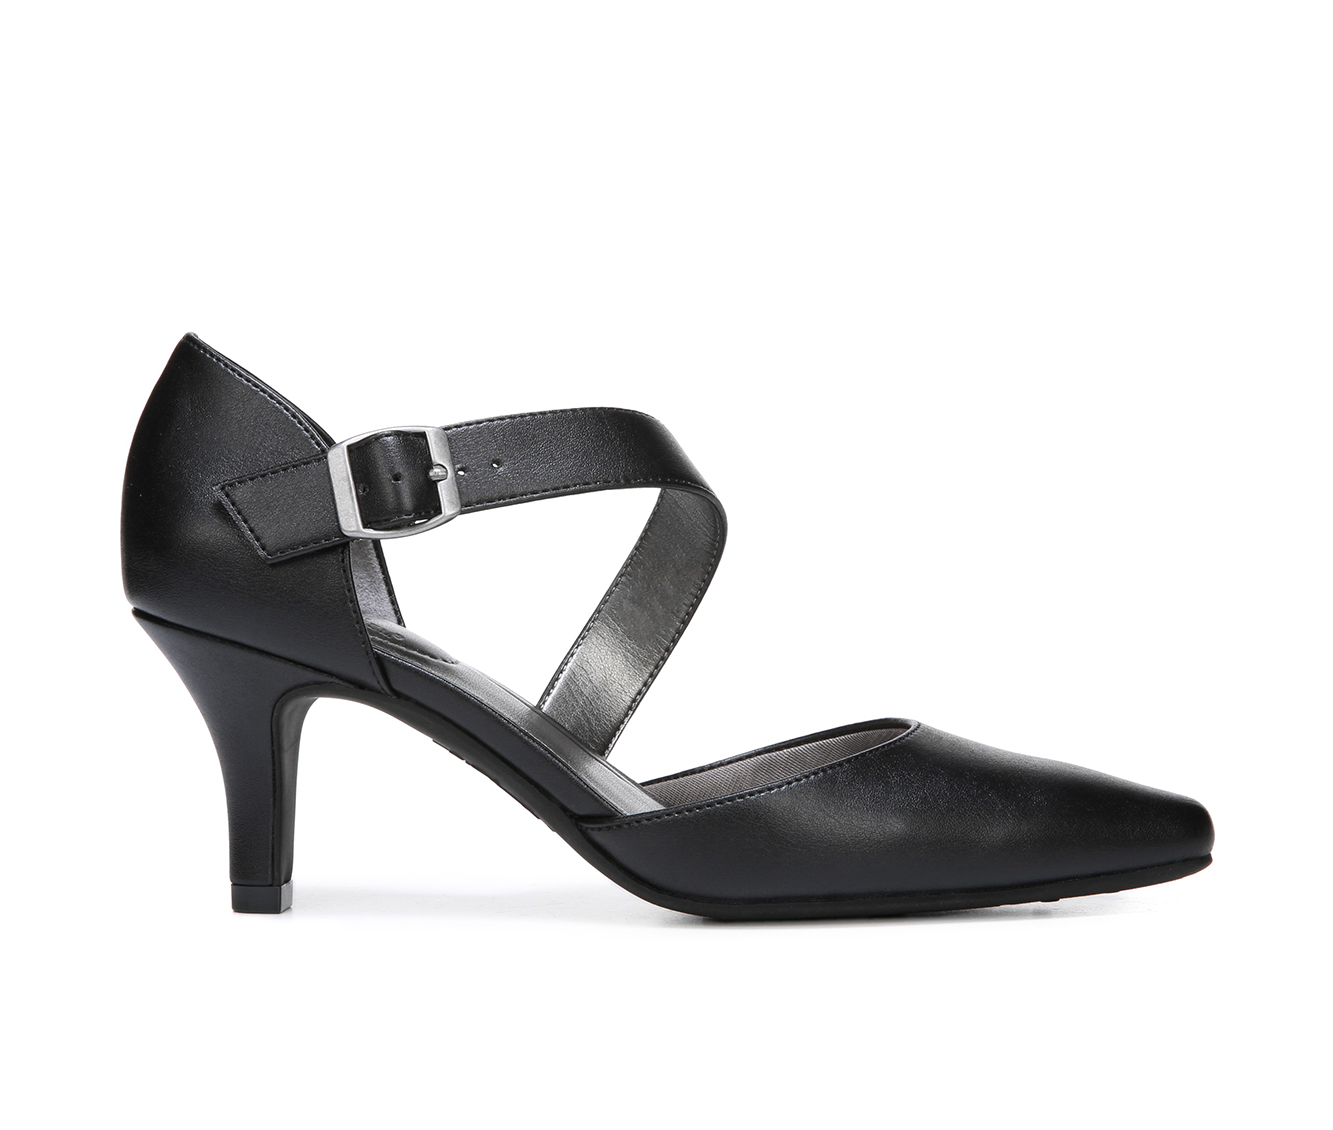 LifeStride Kamala Women's Dress Shoe (Black Faux Leather)